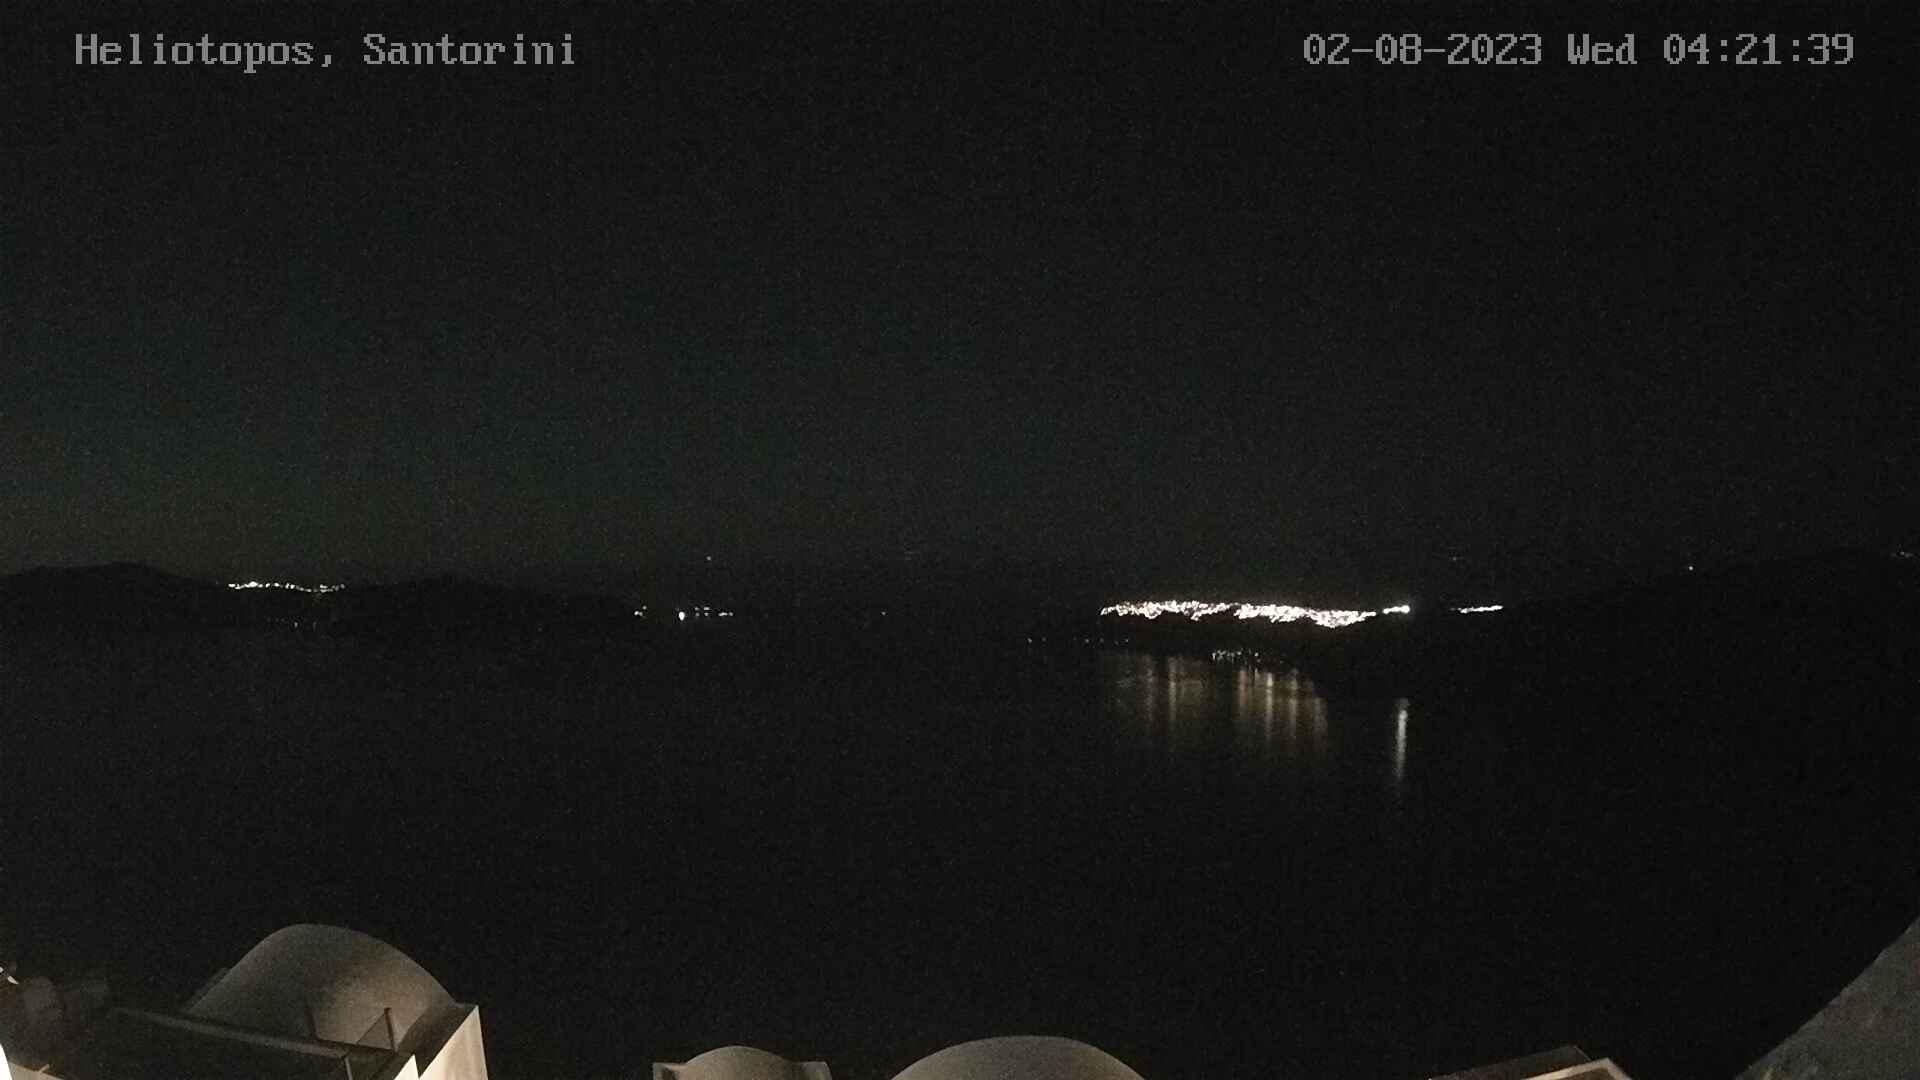 Webkamera Imerovigli: Santorini caldera